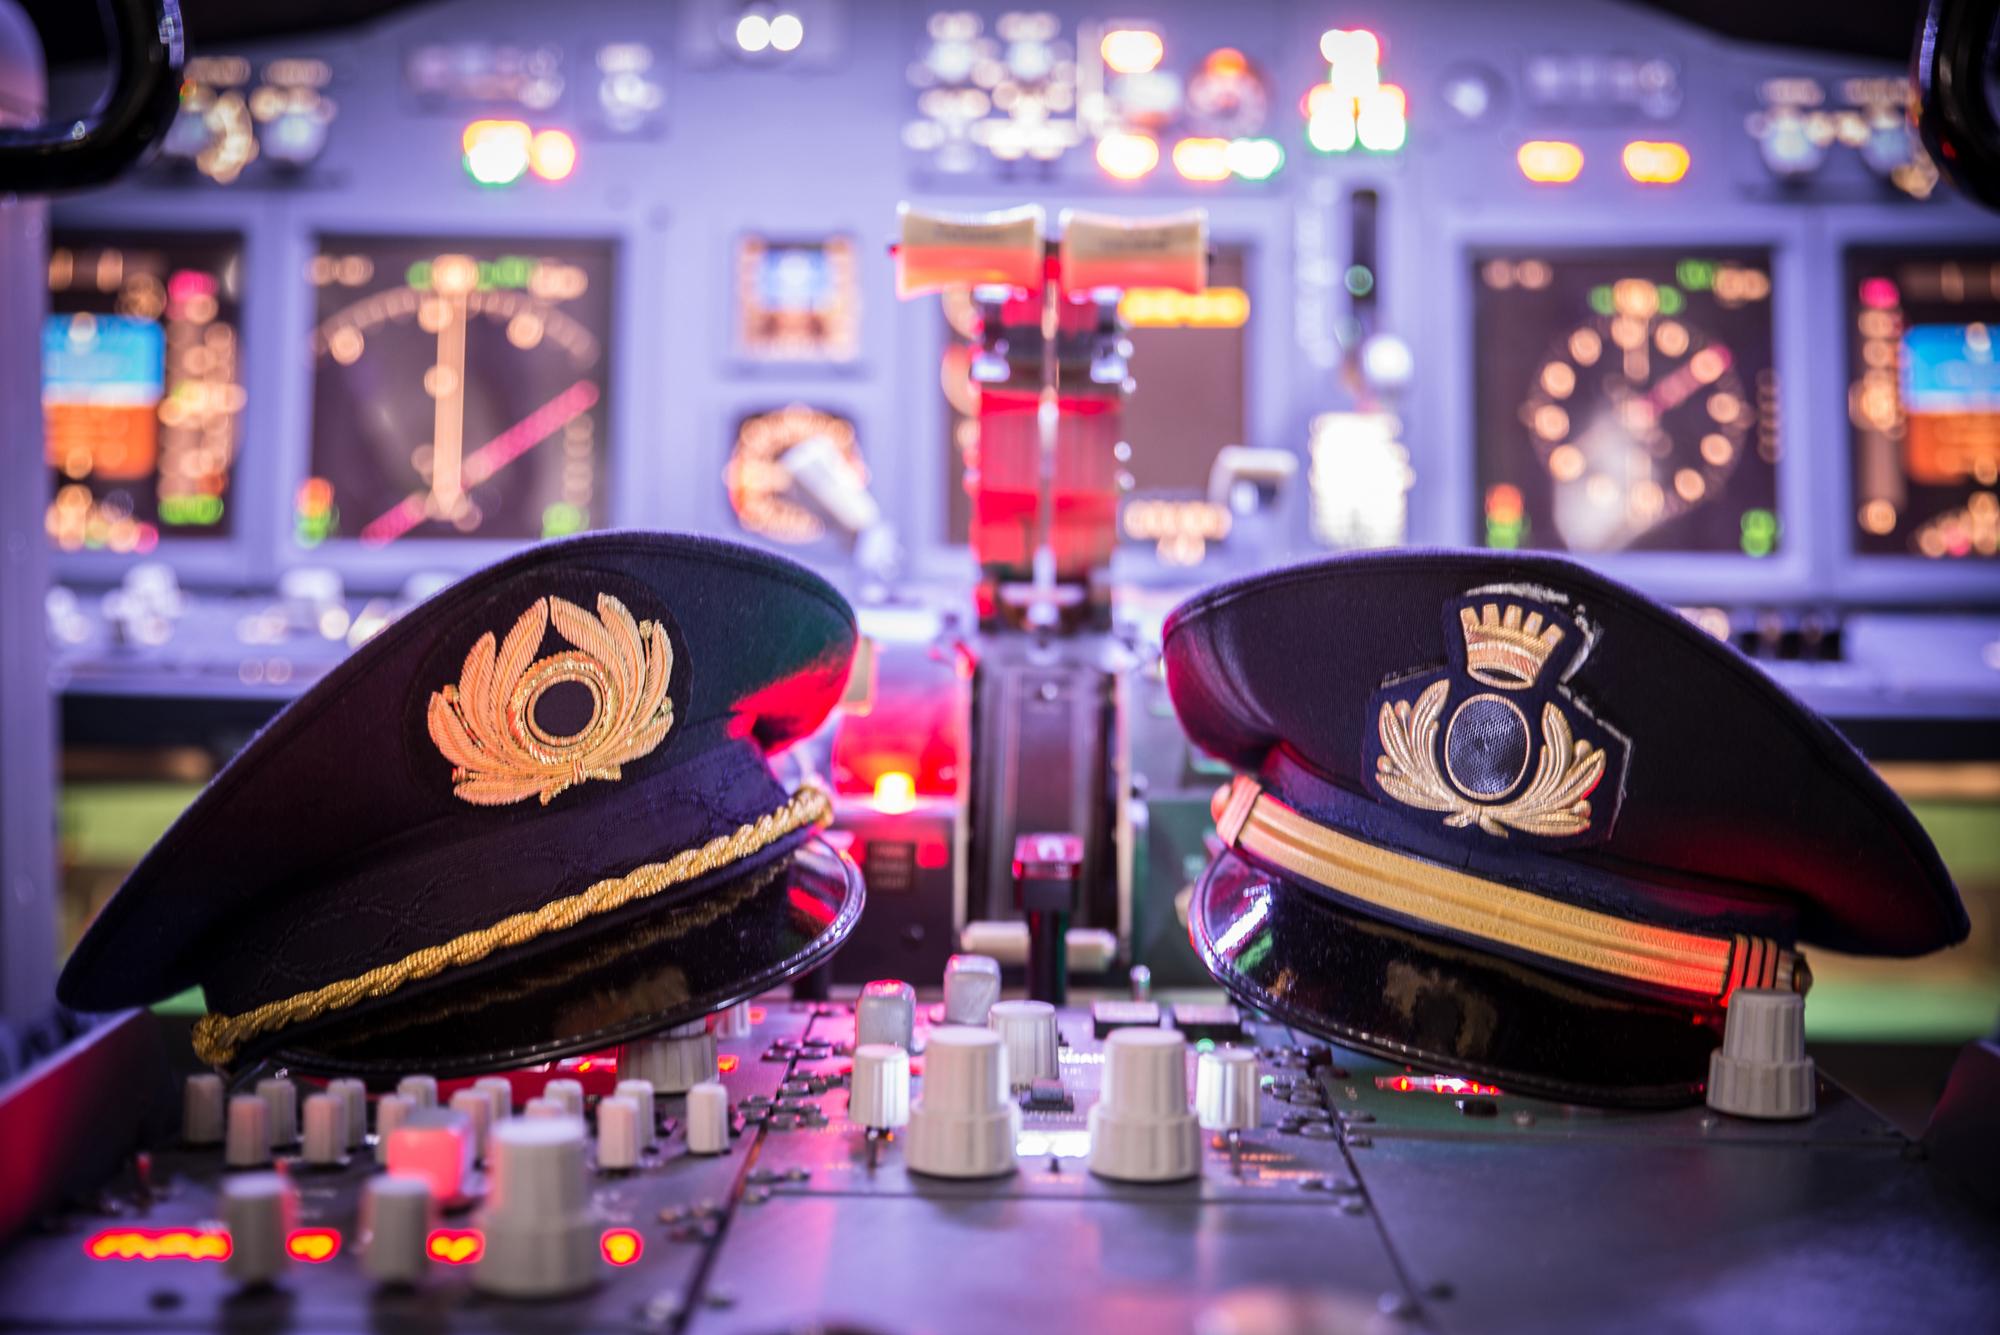 10 Tips from a Pilot on Building a Flight Simulator Rig | B&H Explora